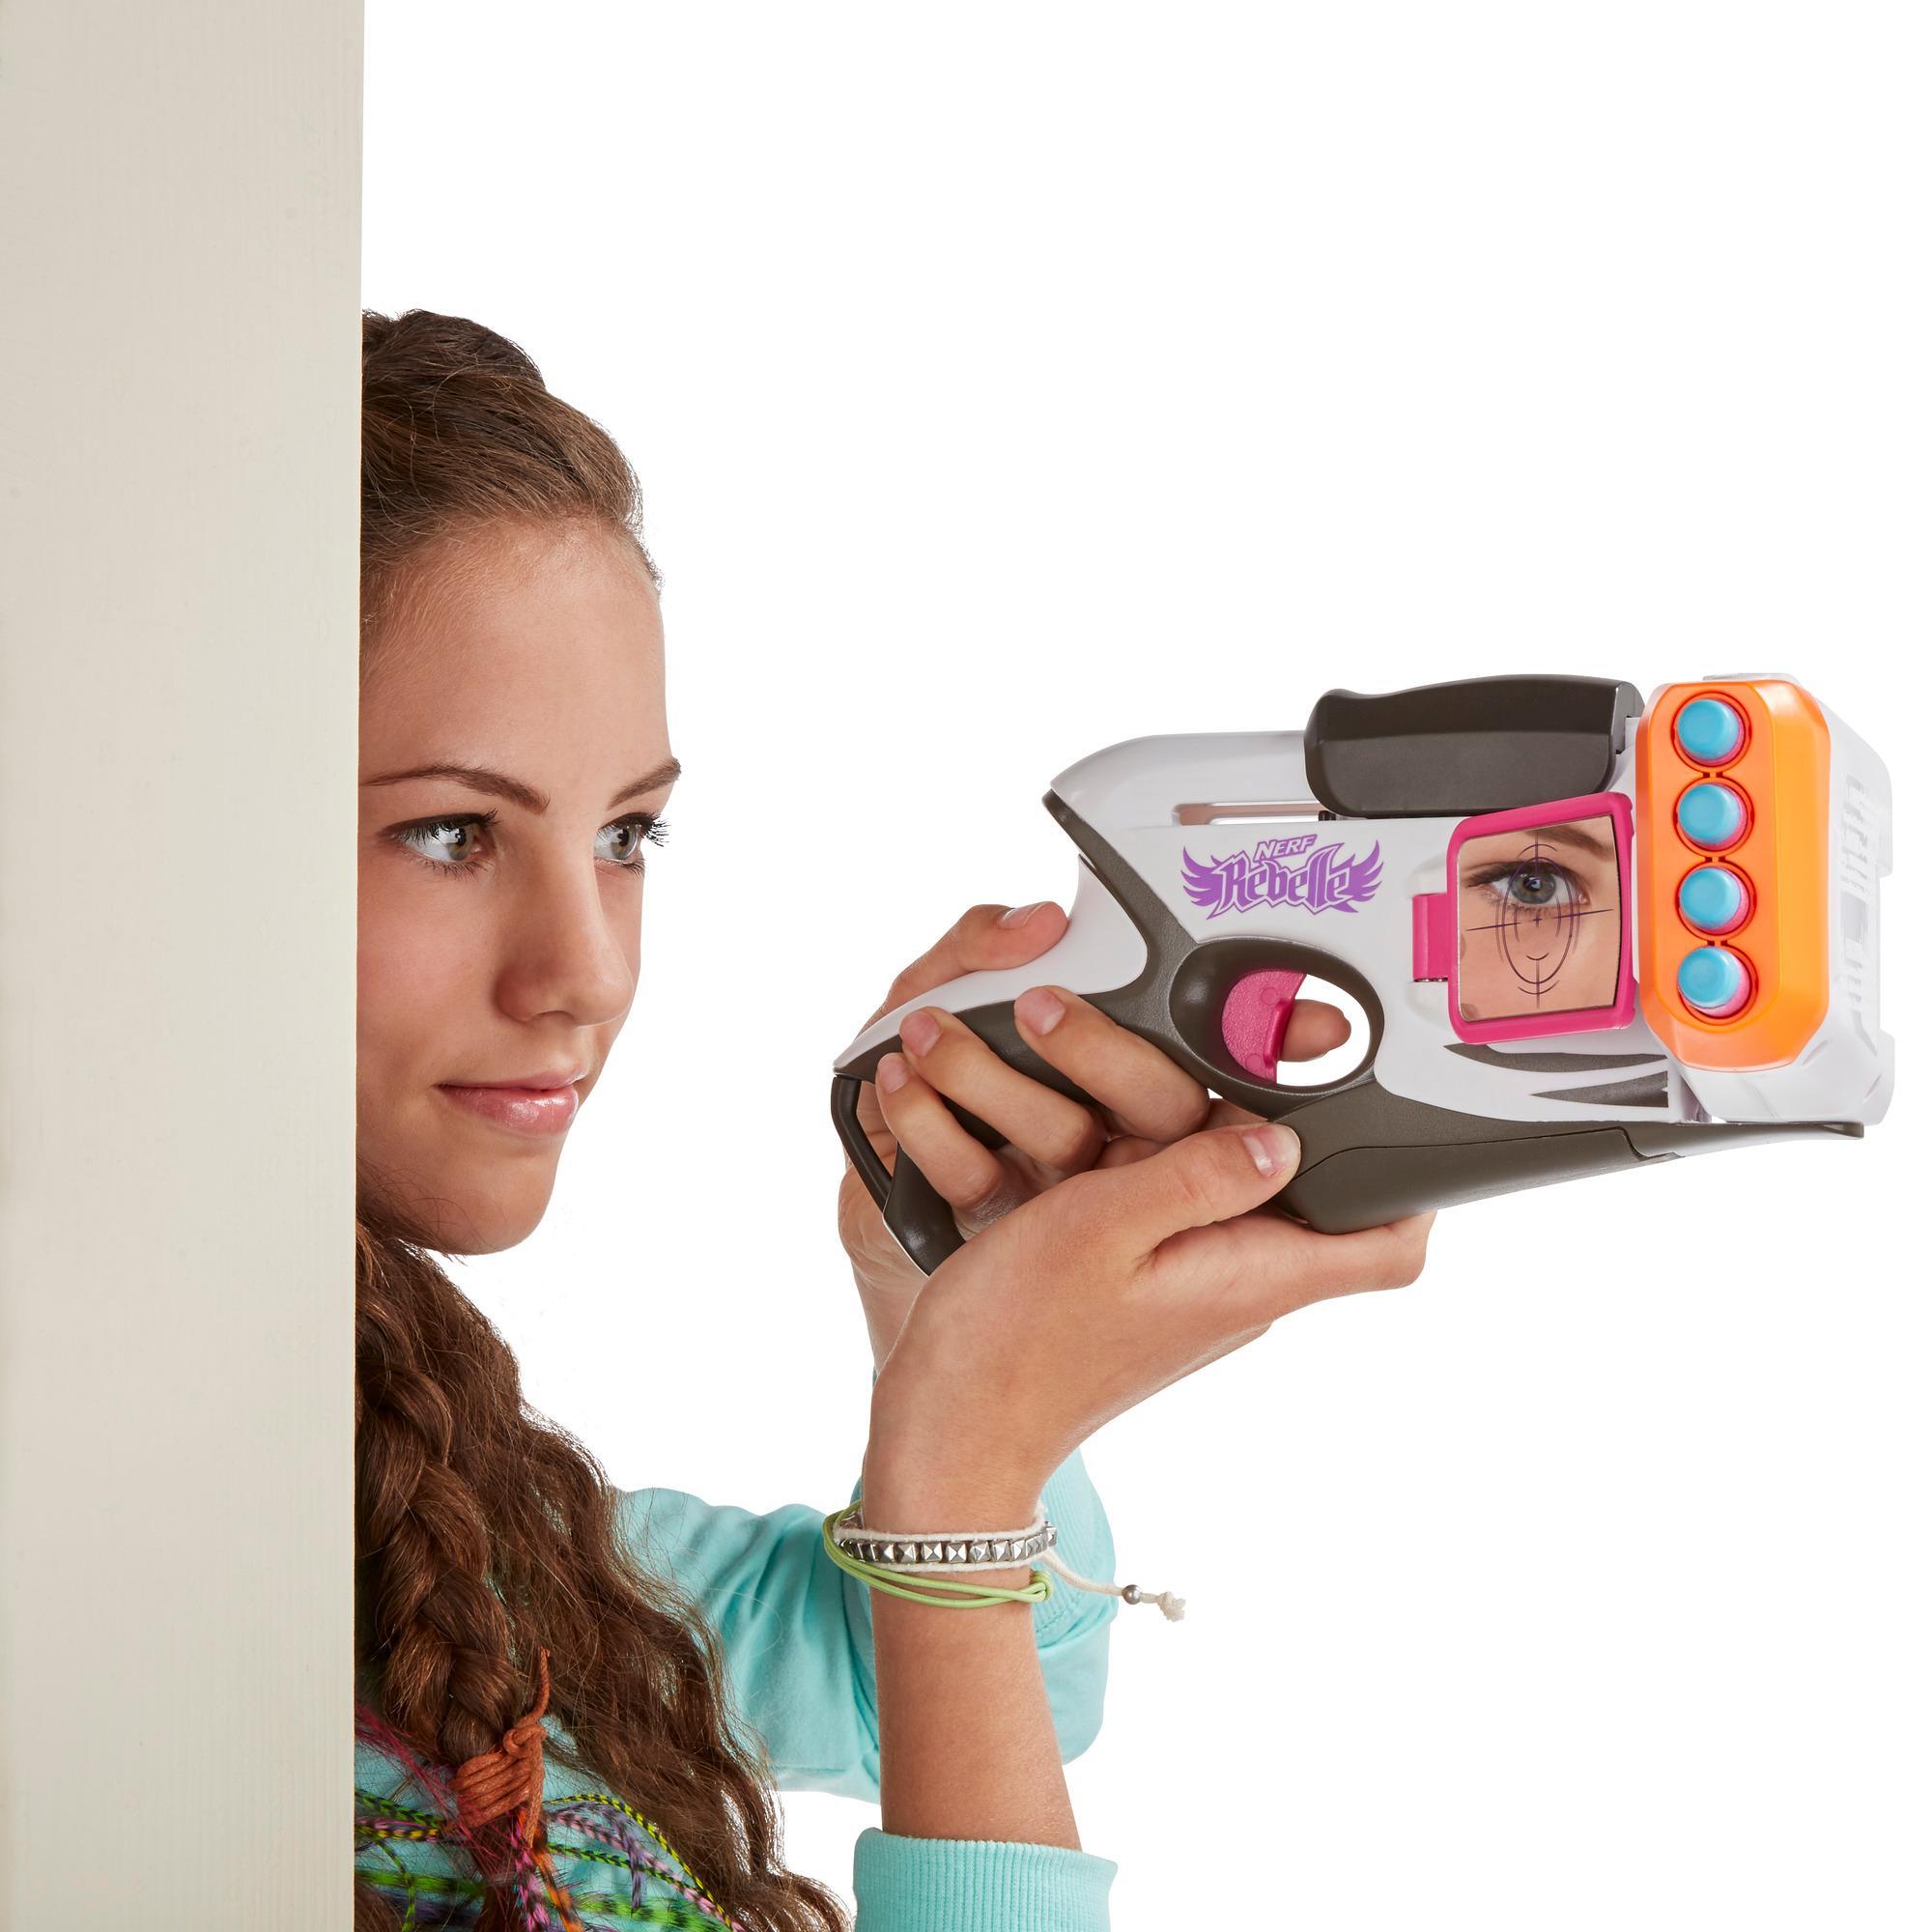 Amazon.com: Nerf Rebelle CornerSight Blaster: Toys & Games